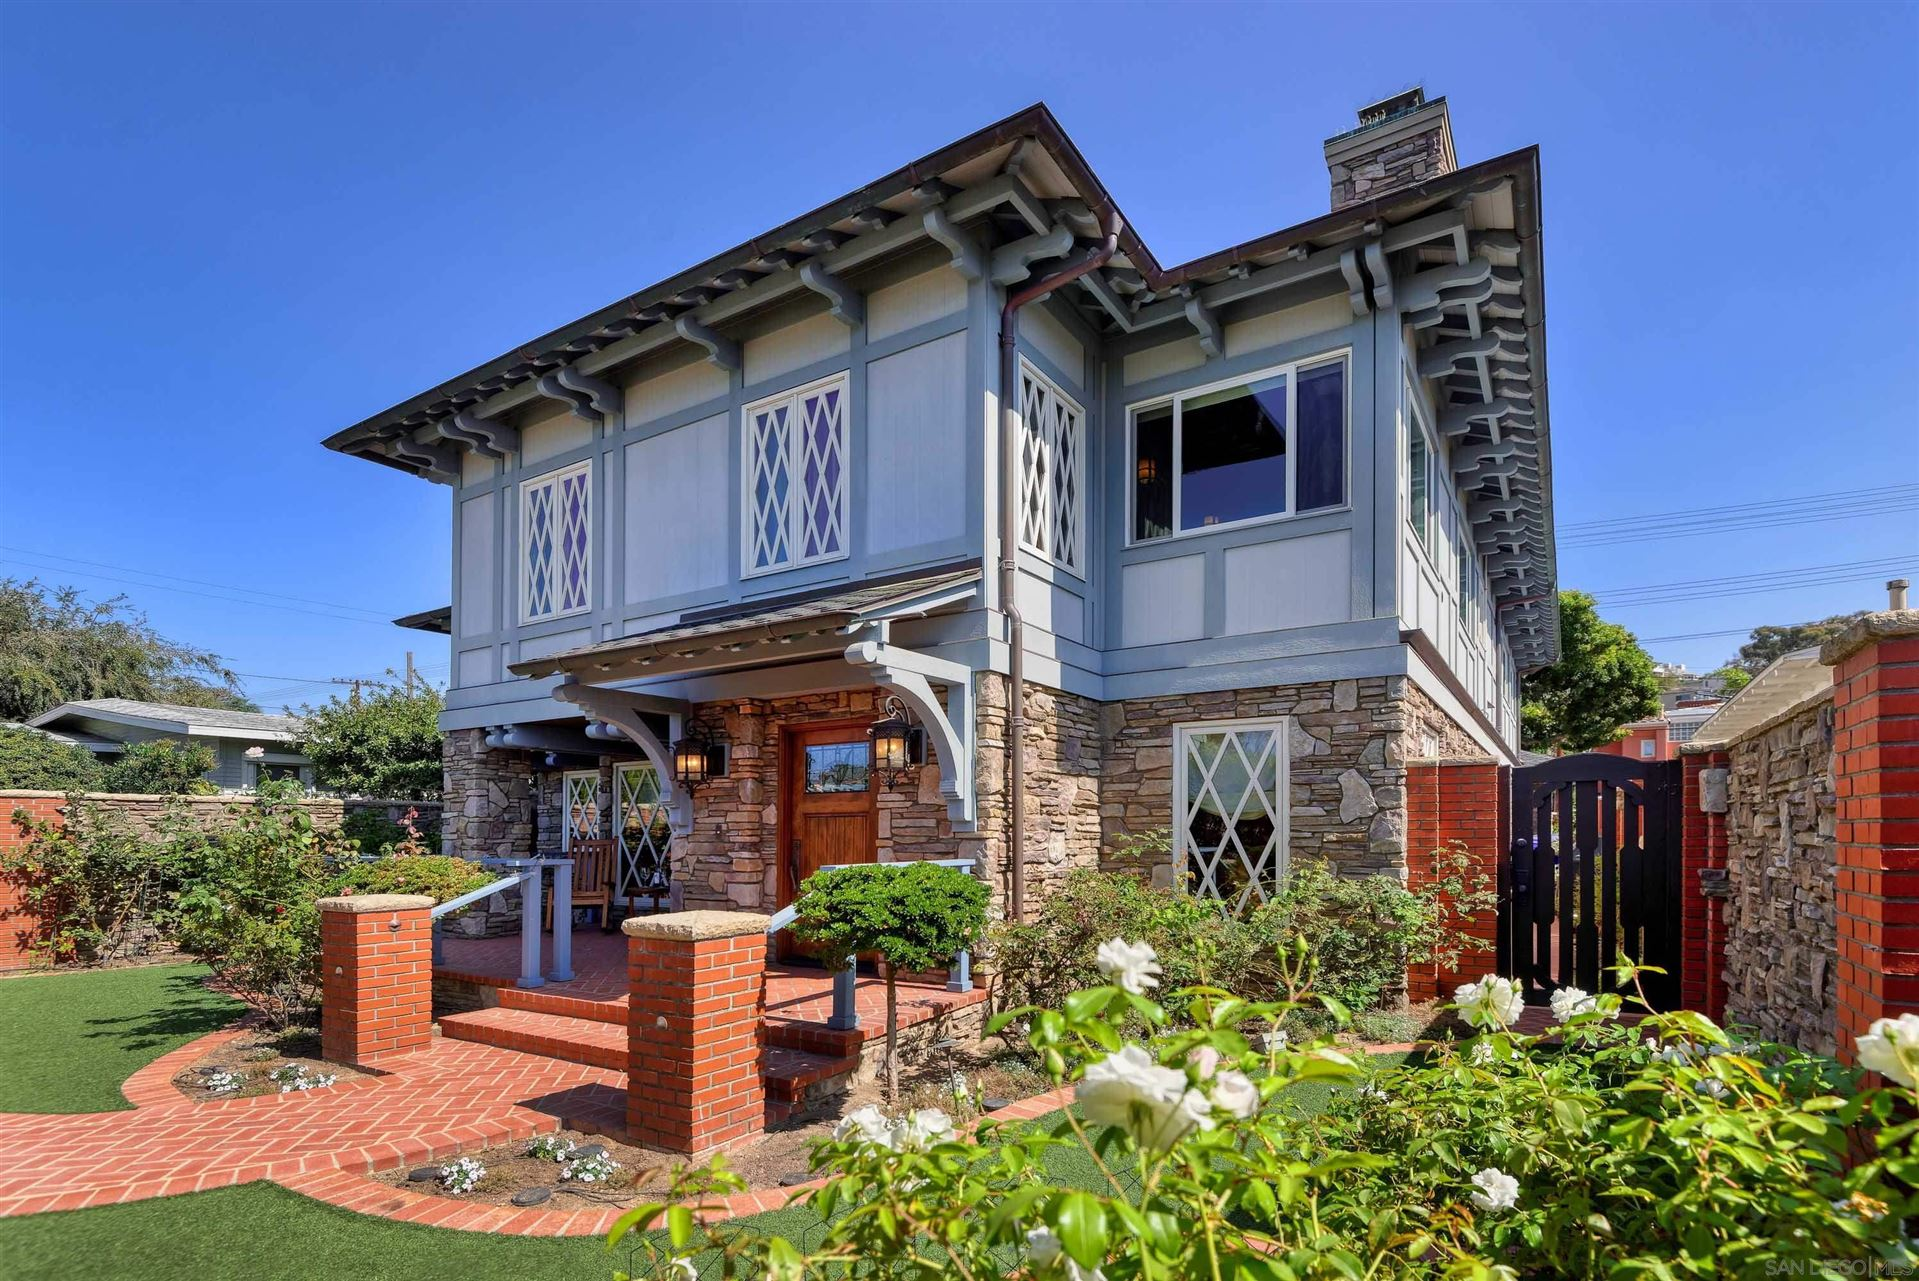 Photo of 1268 Bluebird Lane, La Jolla, CA 92037 (MLS # 210026521)